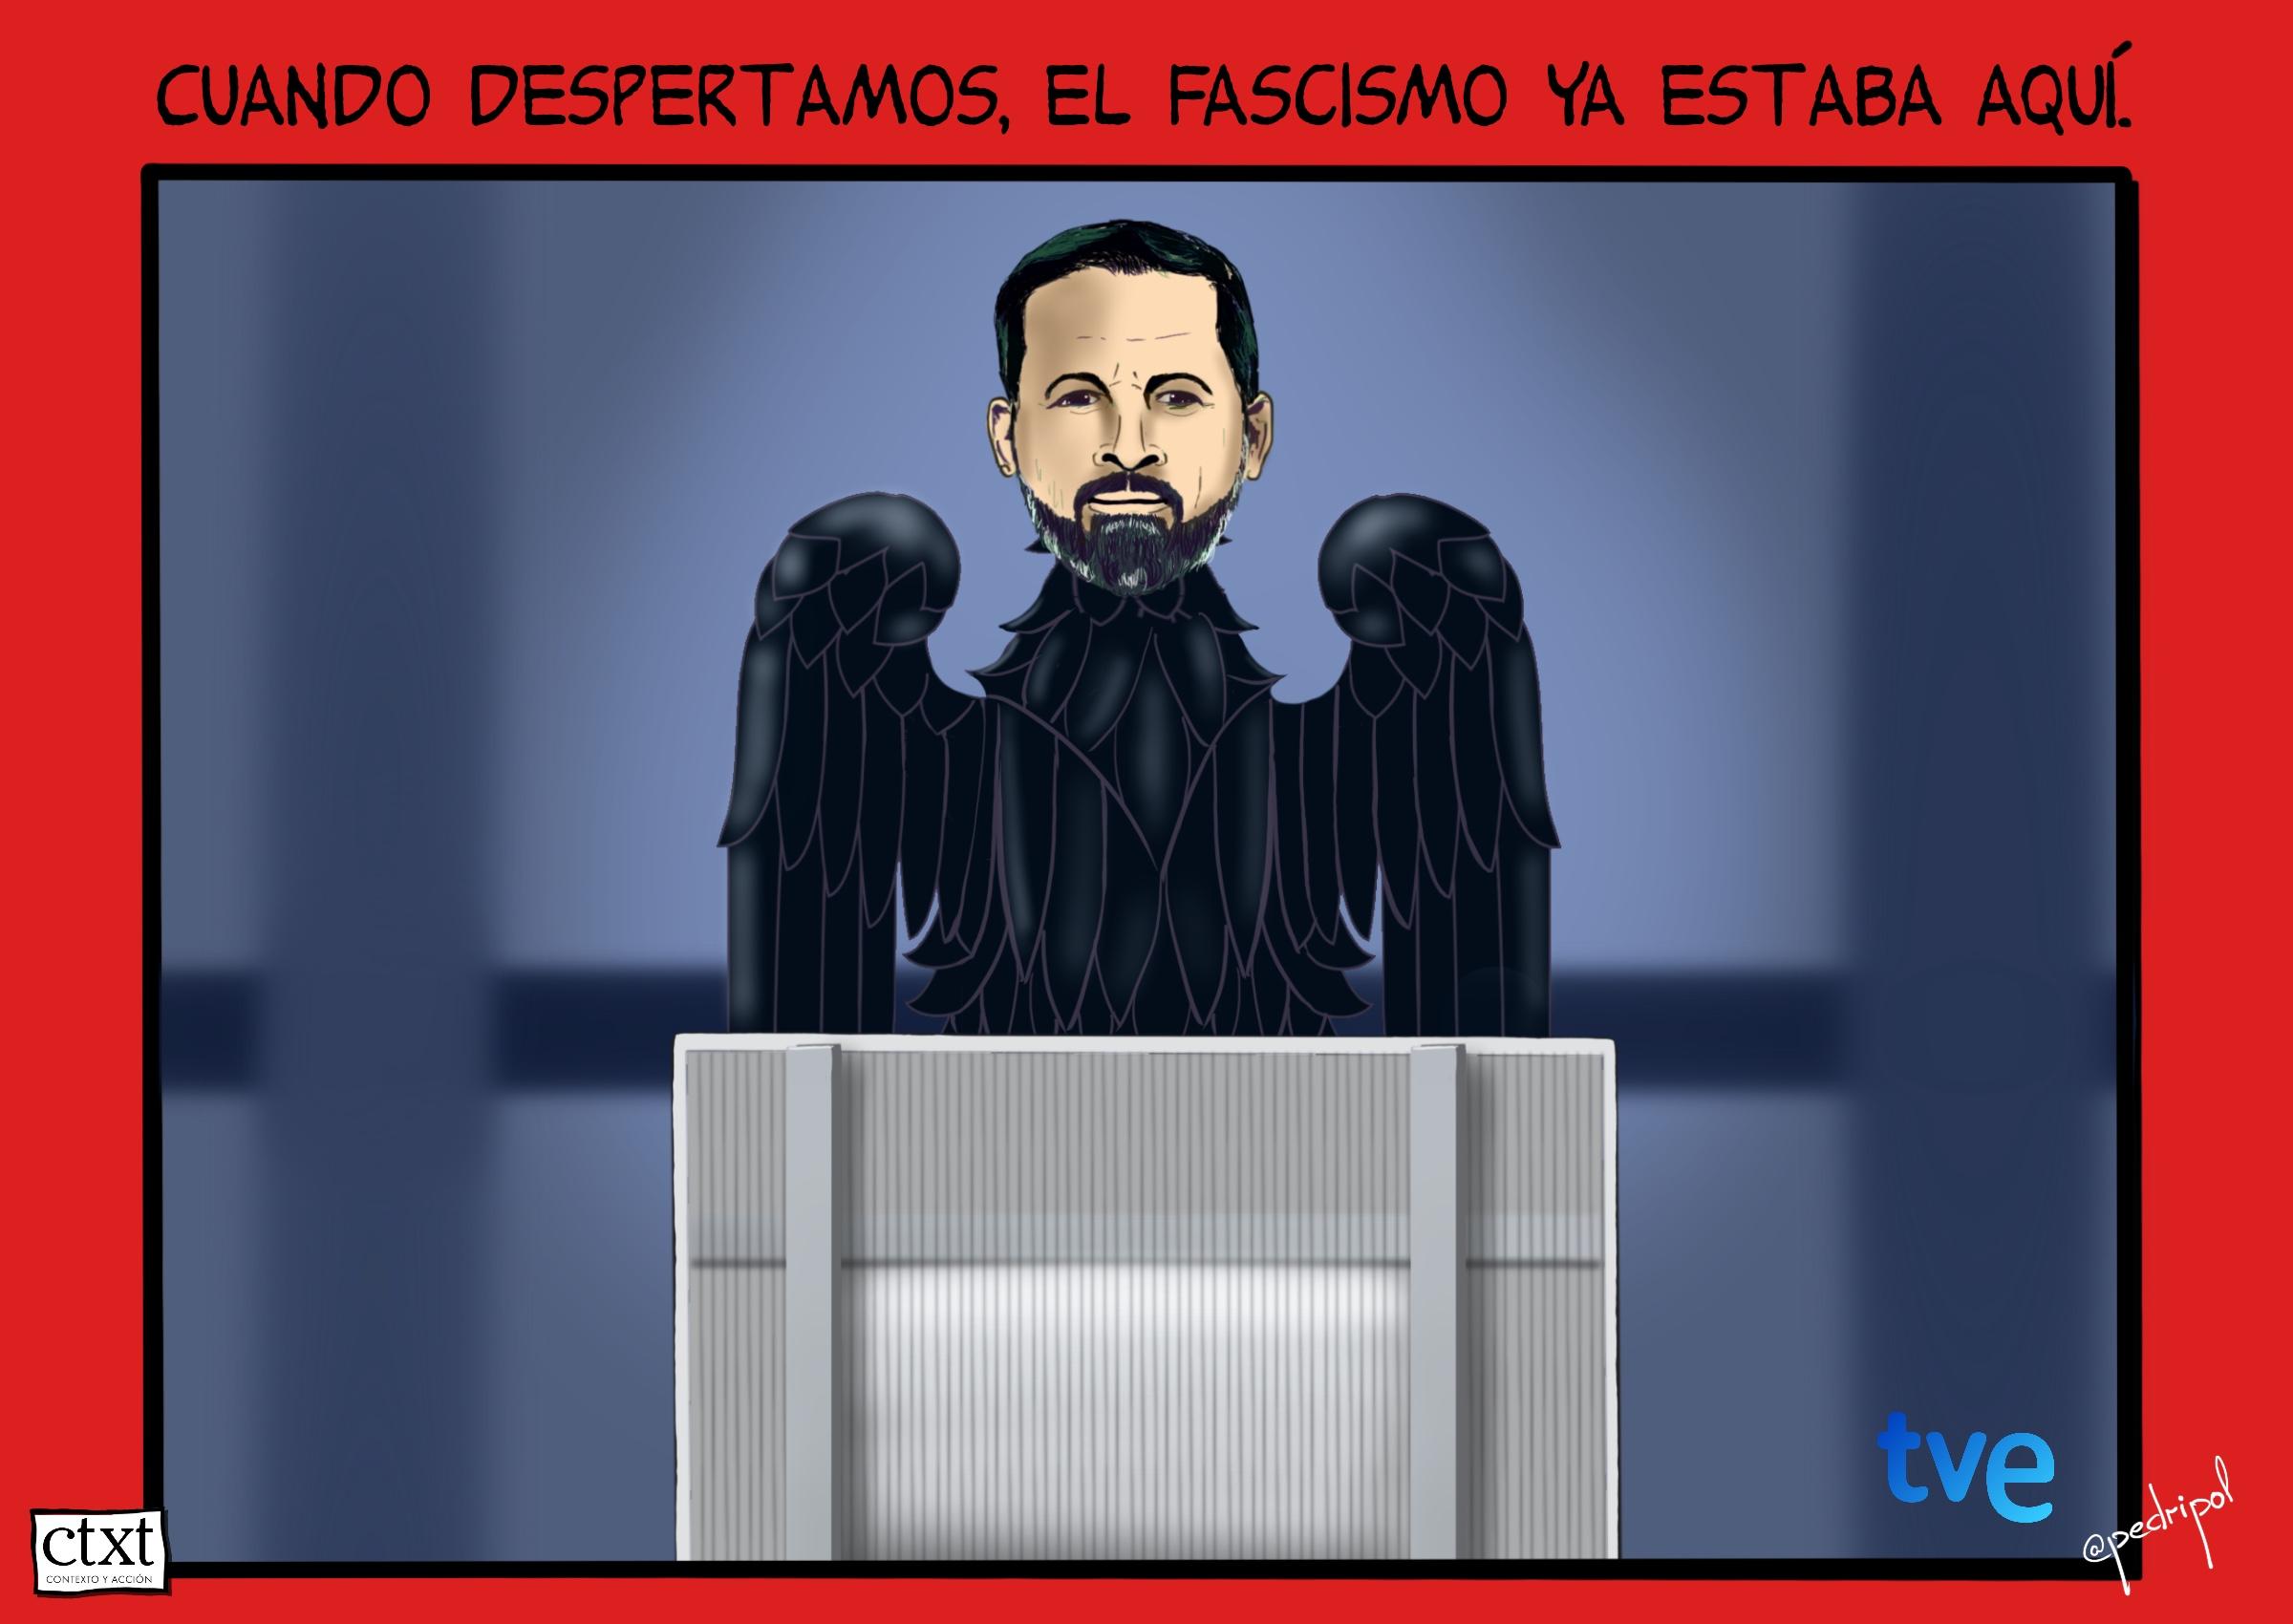 <p>Debate electoral, 10N, fascismo</p>